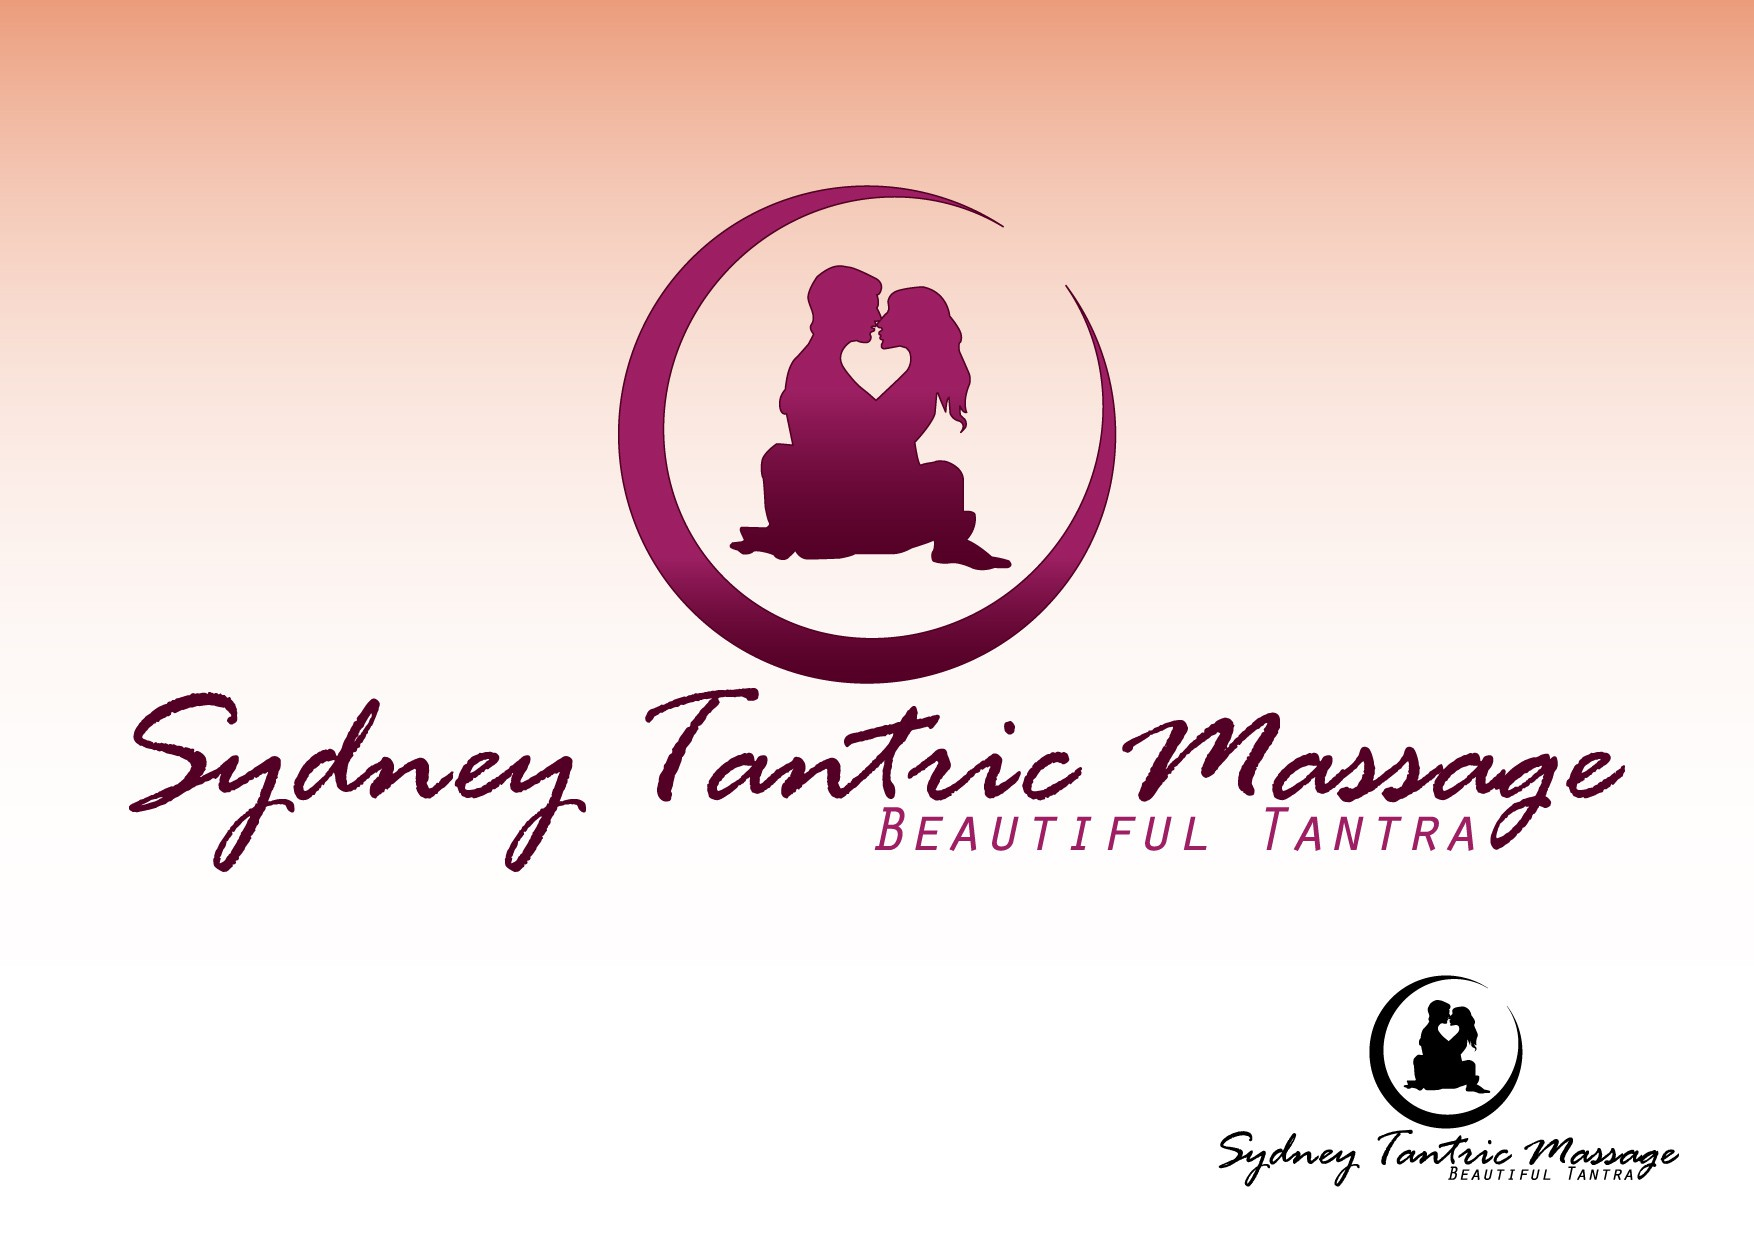 Create the next logo for Sydney Tantric Massage